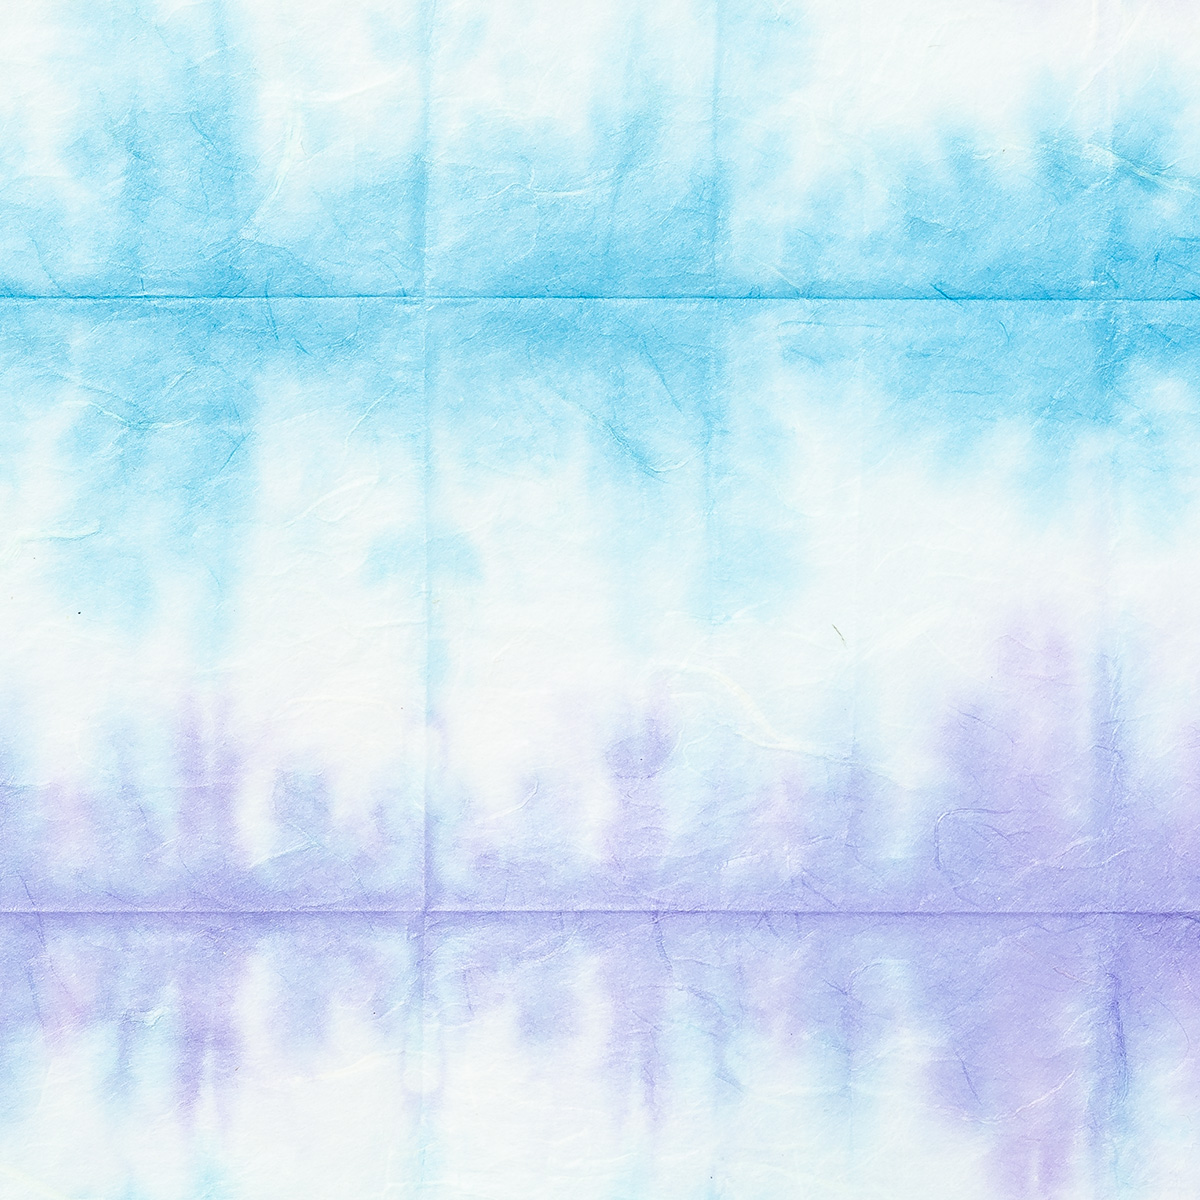 楮6匁 雲竜紙 板締め No.22